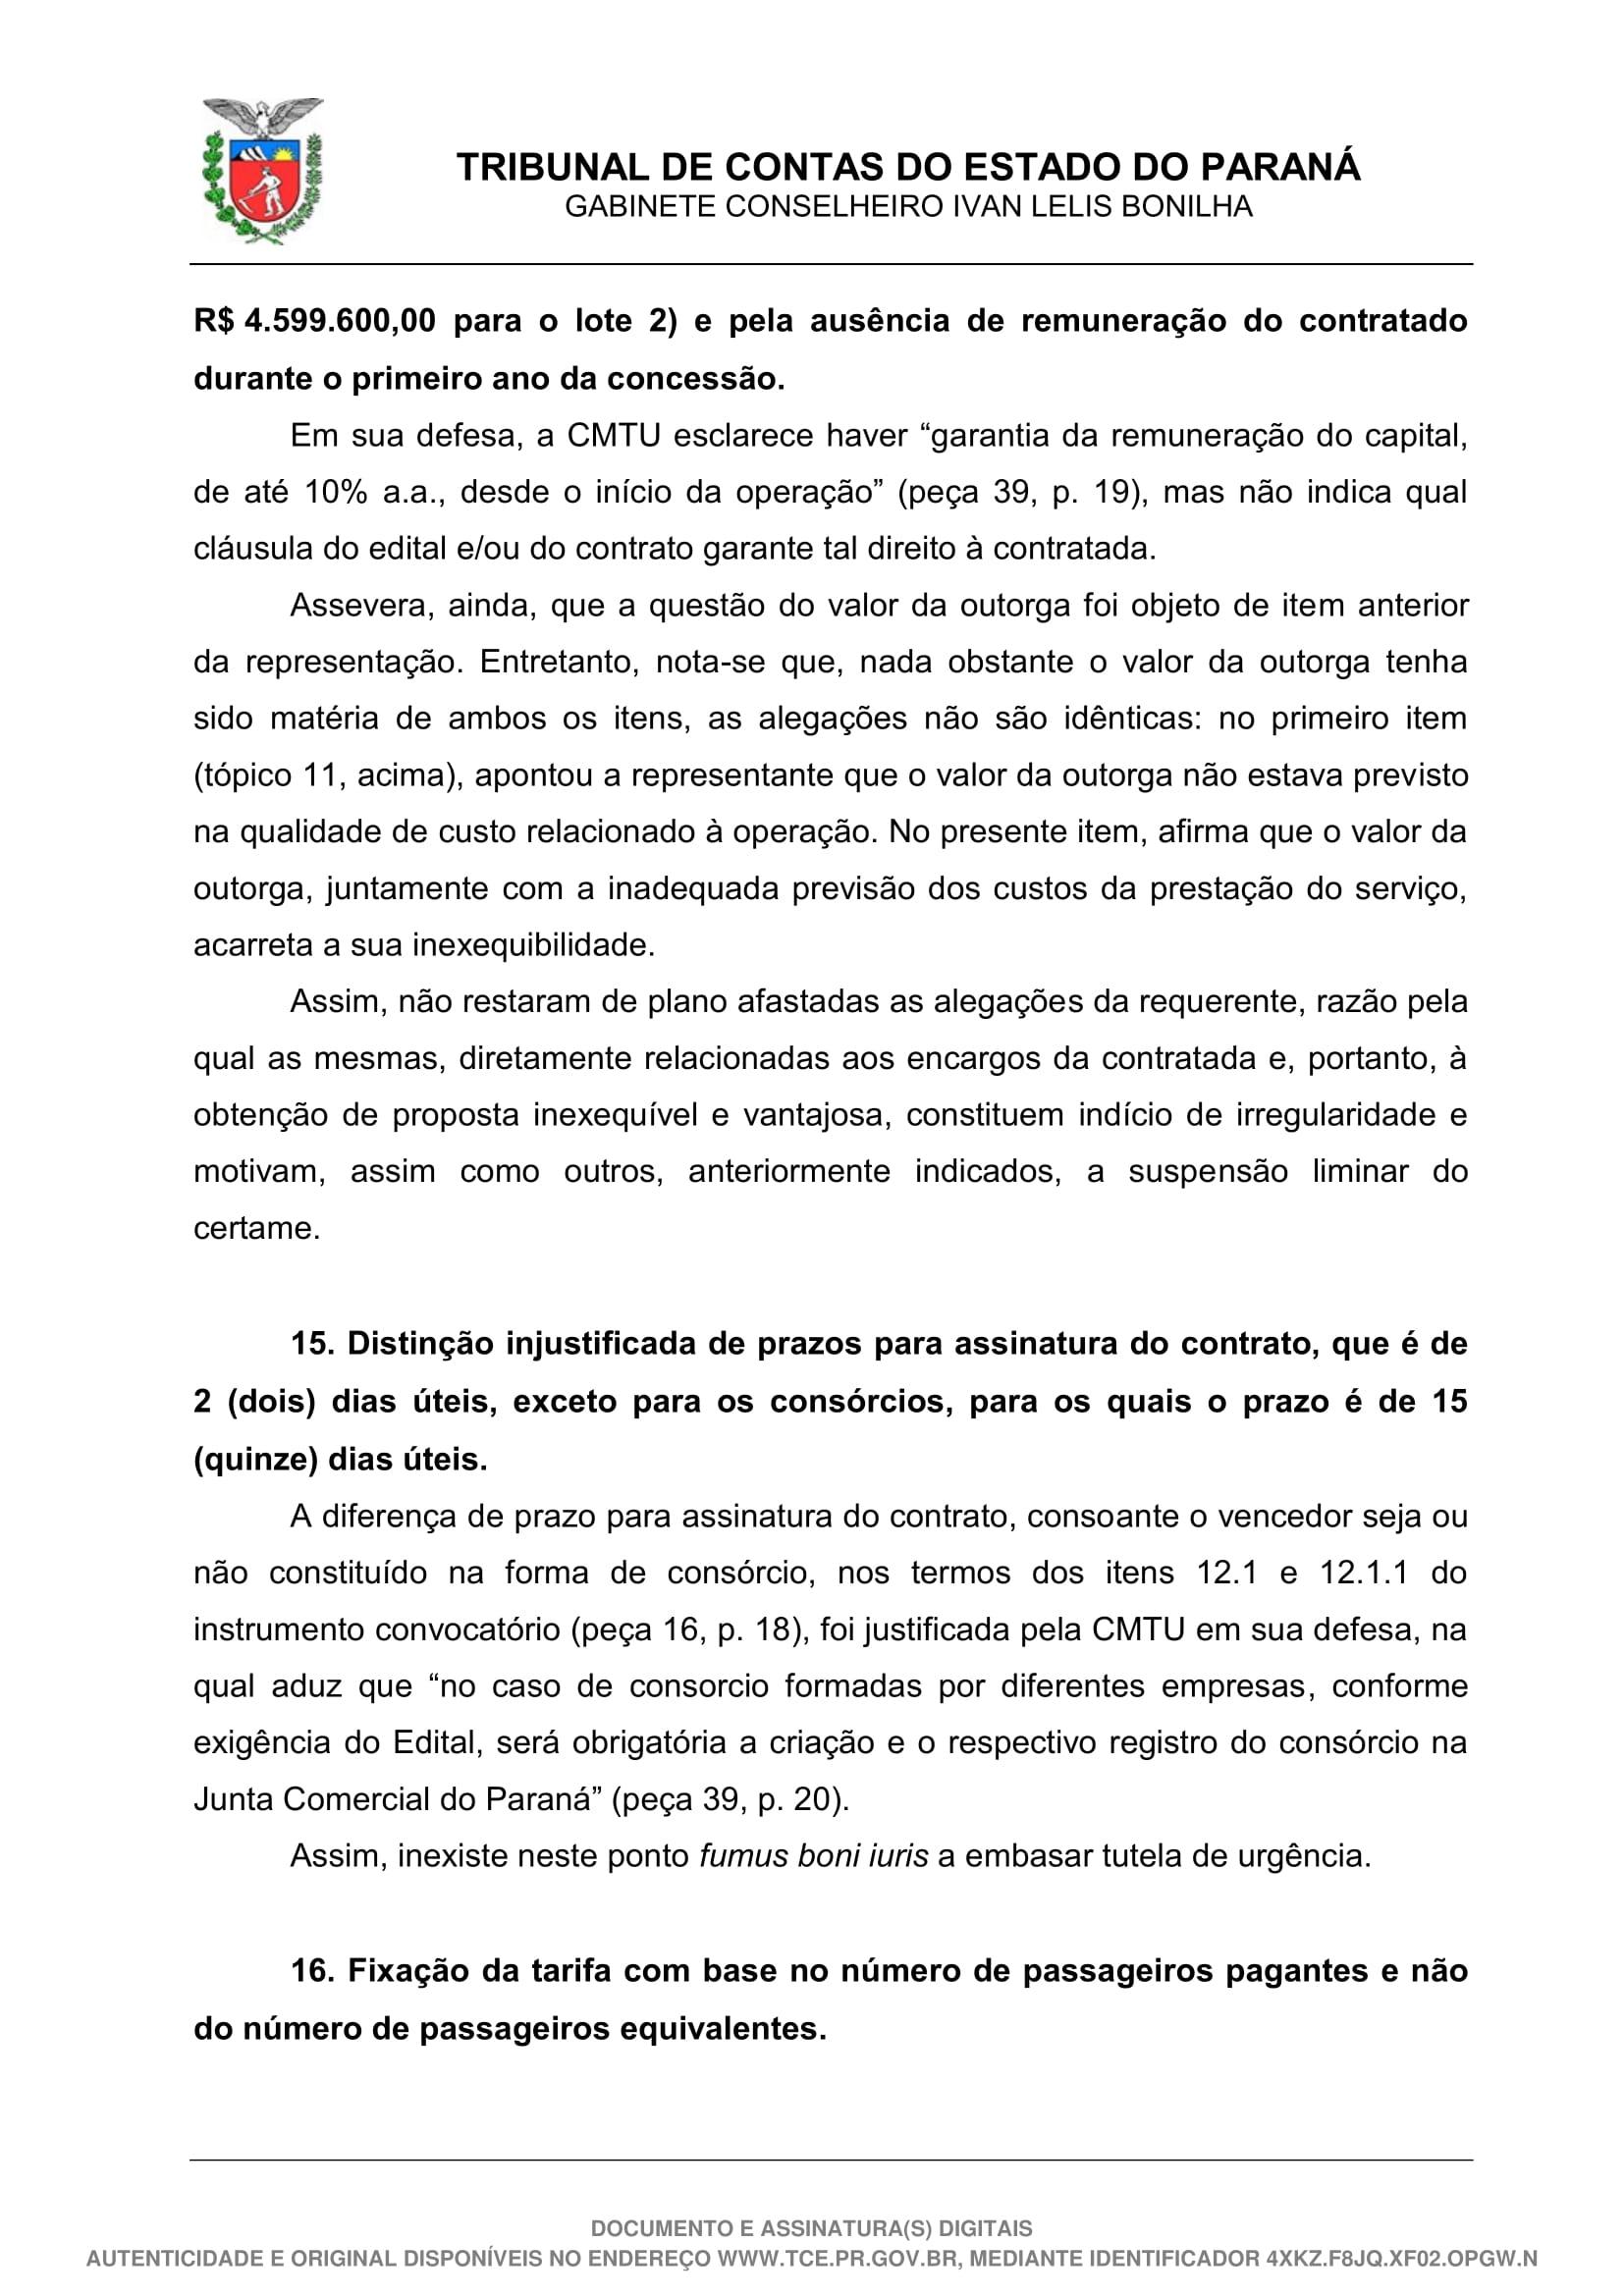 Despacho - 49-19 - GCILB-15